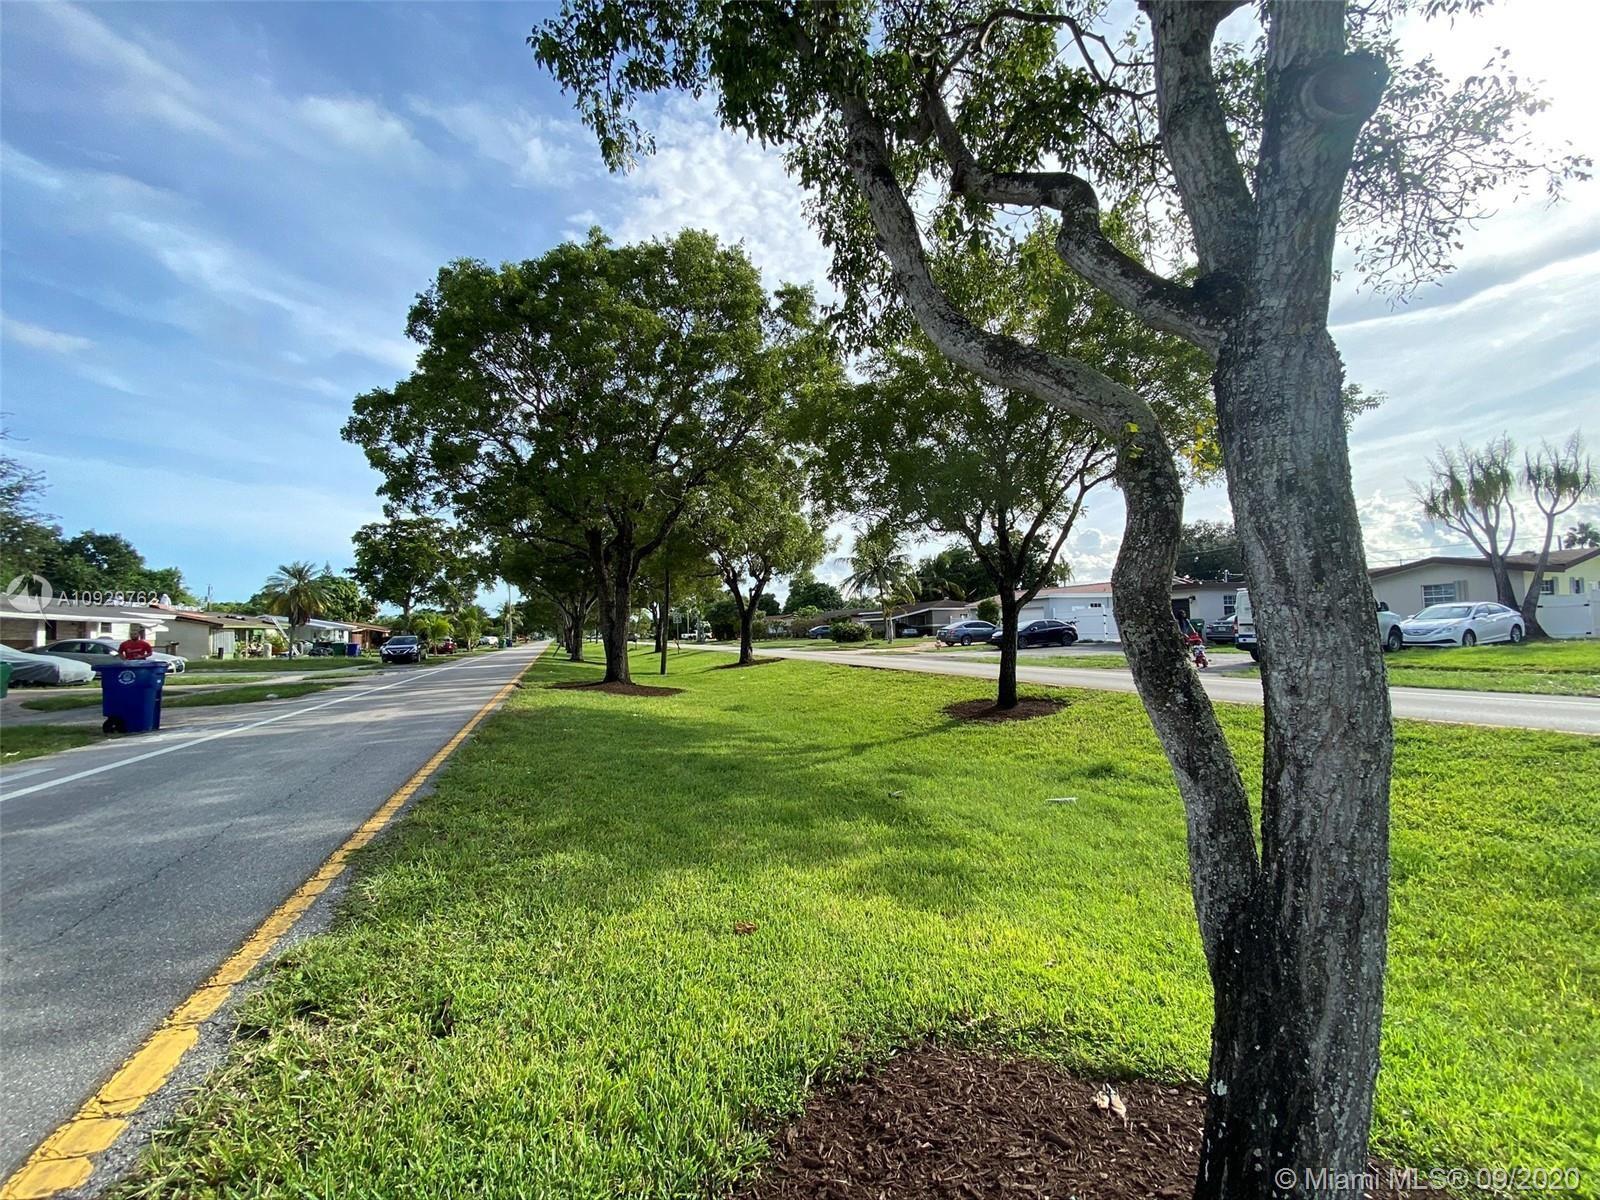 Photo of 2271 Island Dr, Miramar, FL 33023 (MLS # A10929762)